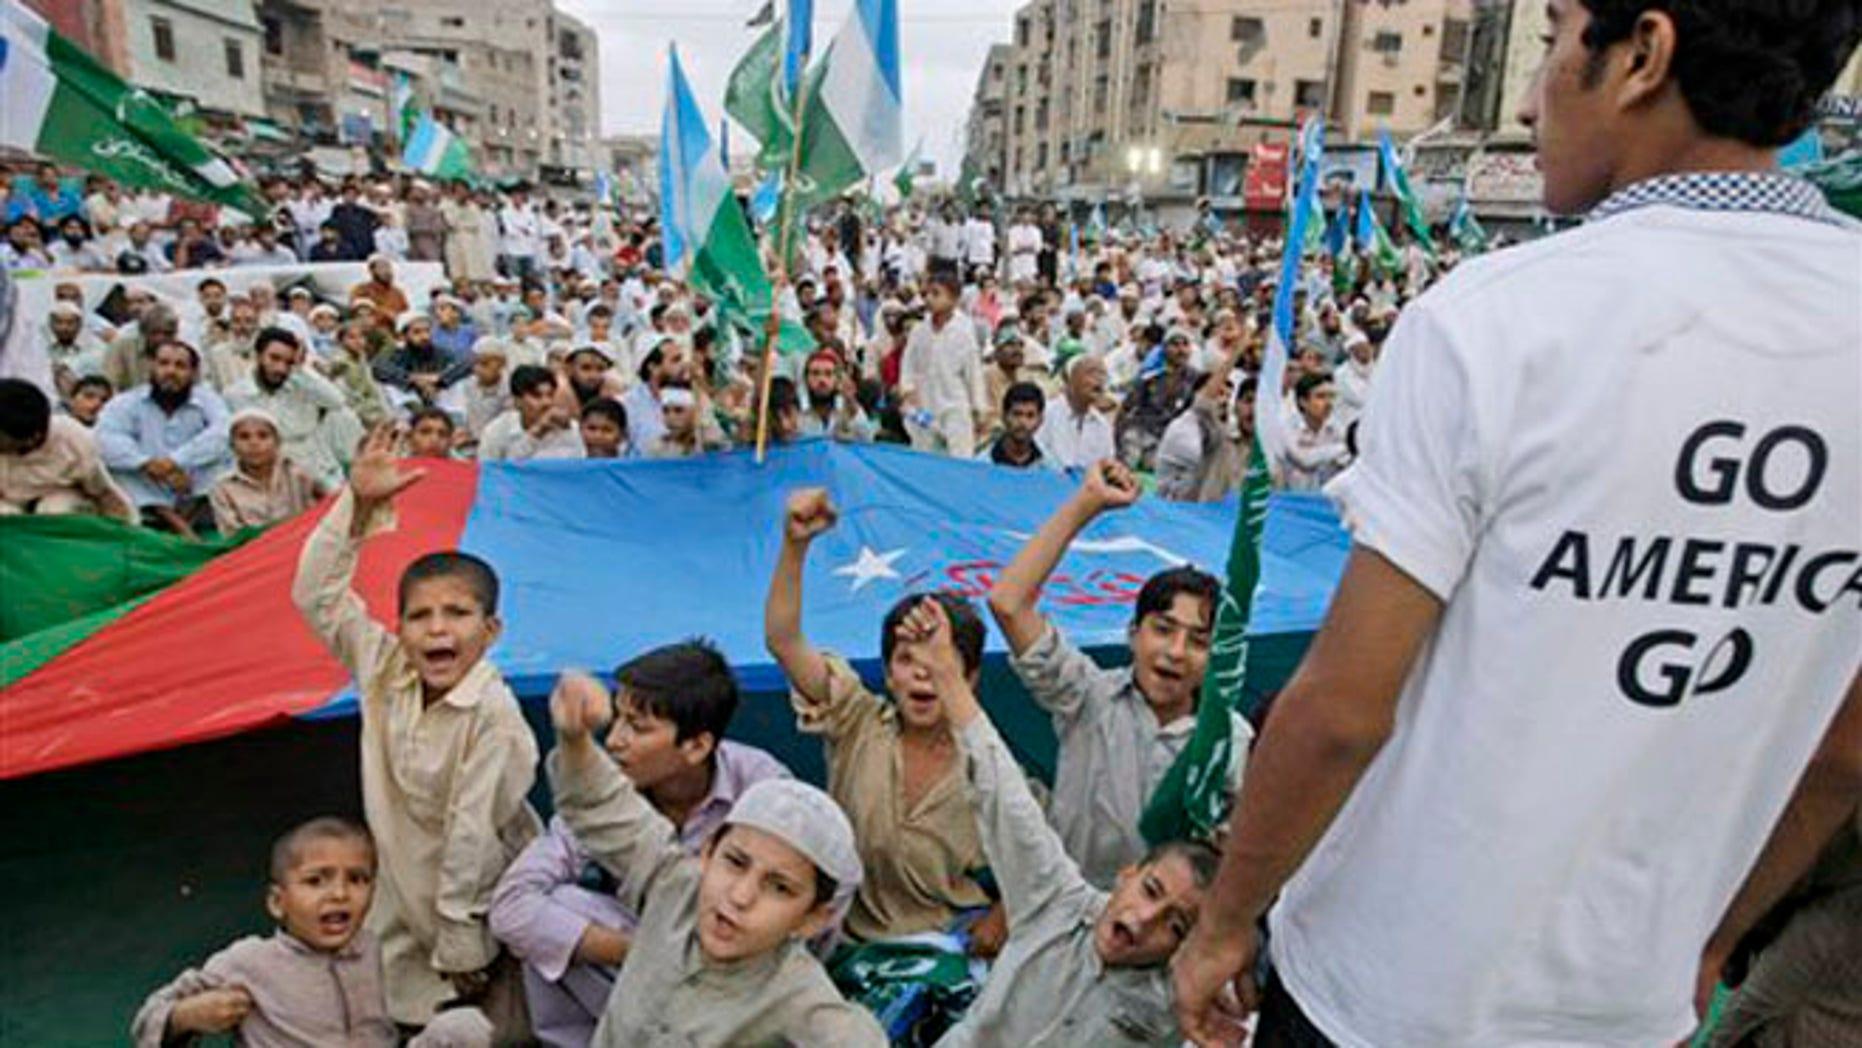 June 10, 2012: Pakistani boys chant slogans during an anti-U.S. rally organized by religious party Jamat-e-Islami in Karachi, Pakistan.